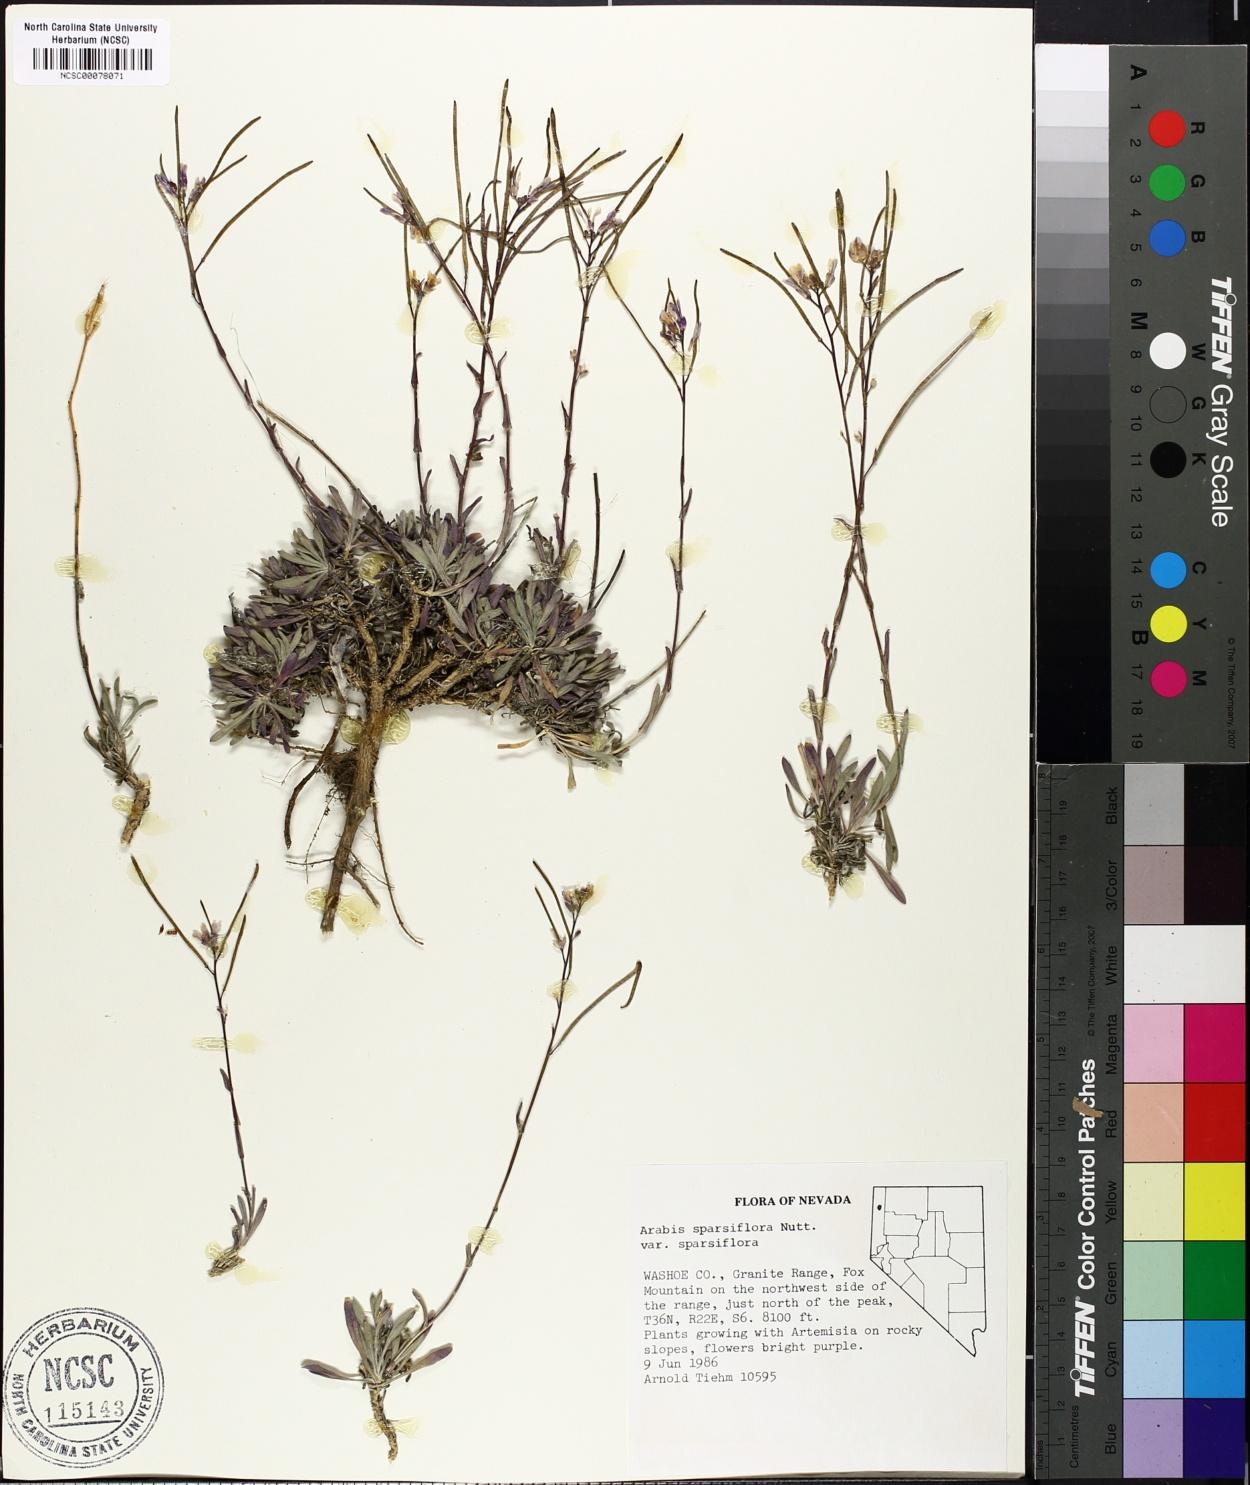 Arabis sparsiflora var. sparsiflora image